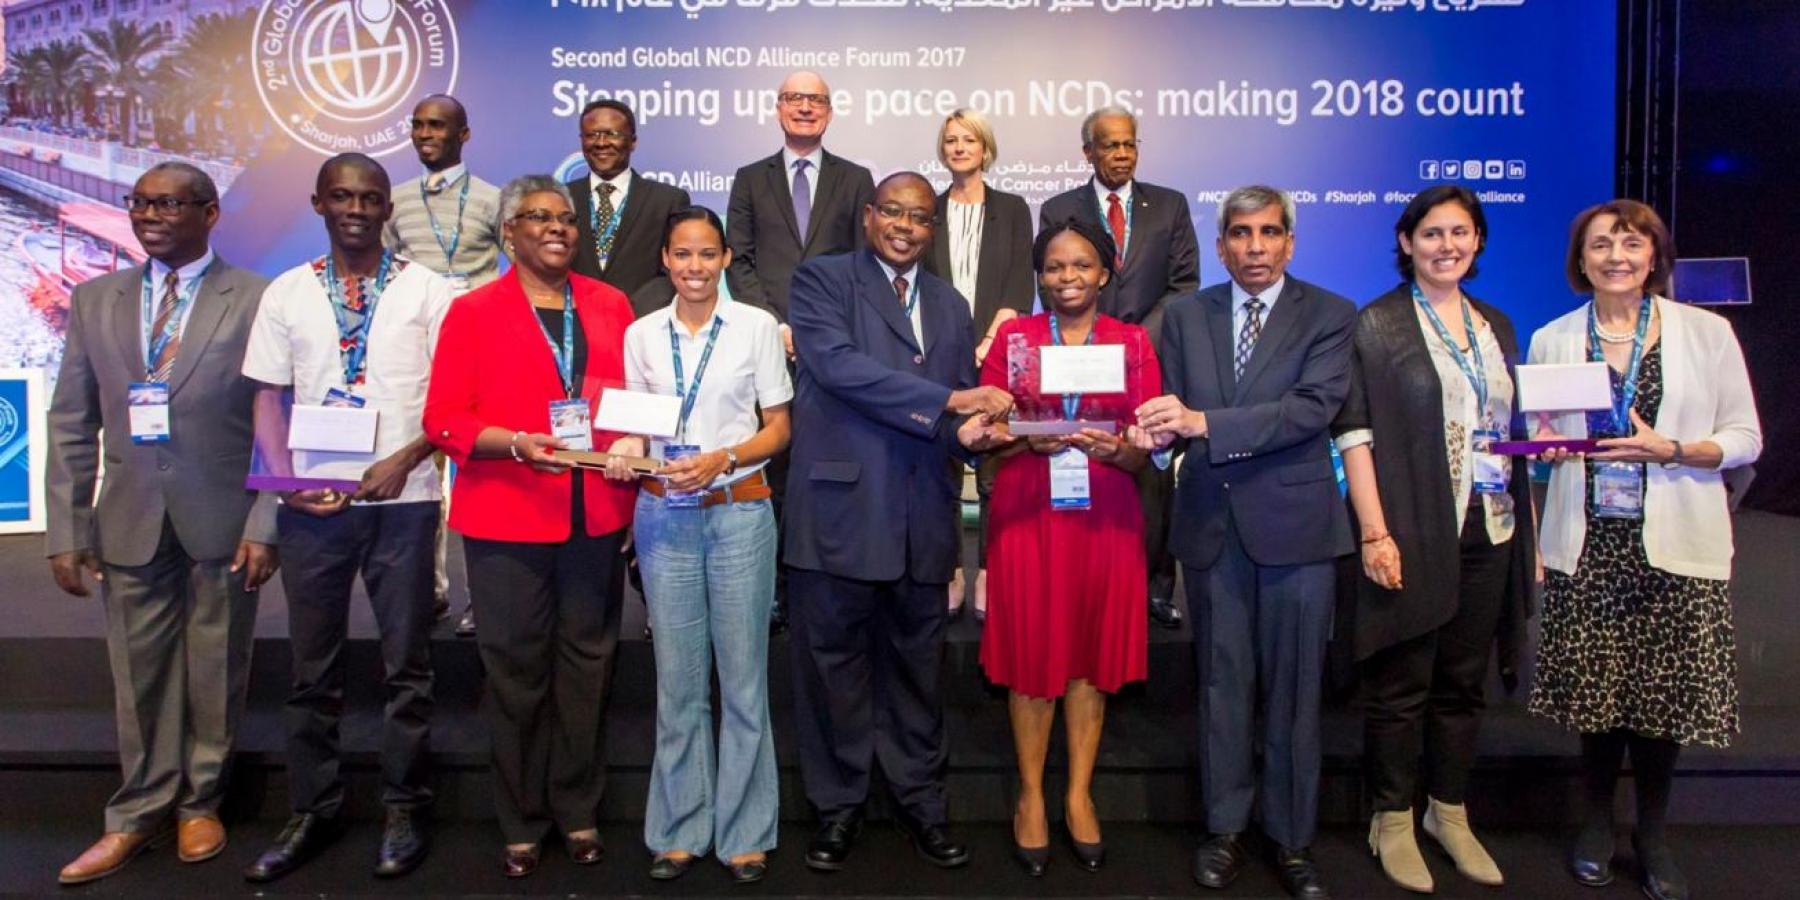 Sharjah Award winners at the NCD Alliance 2017 Global Forum in Sharjah UAE, 11 Dec. 2018